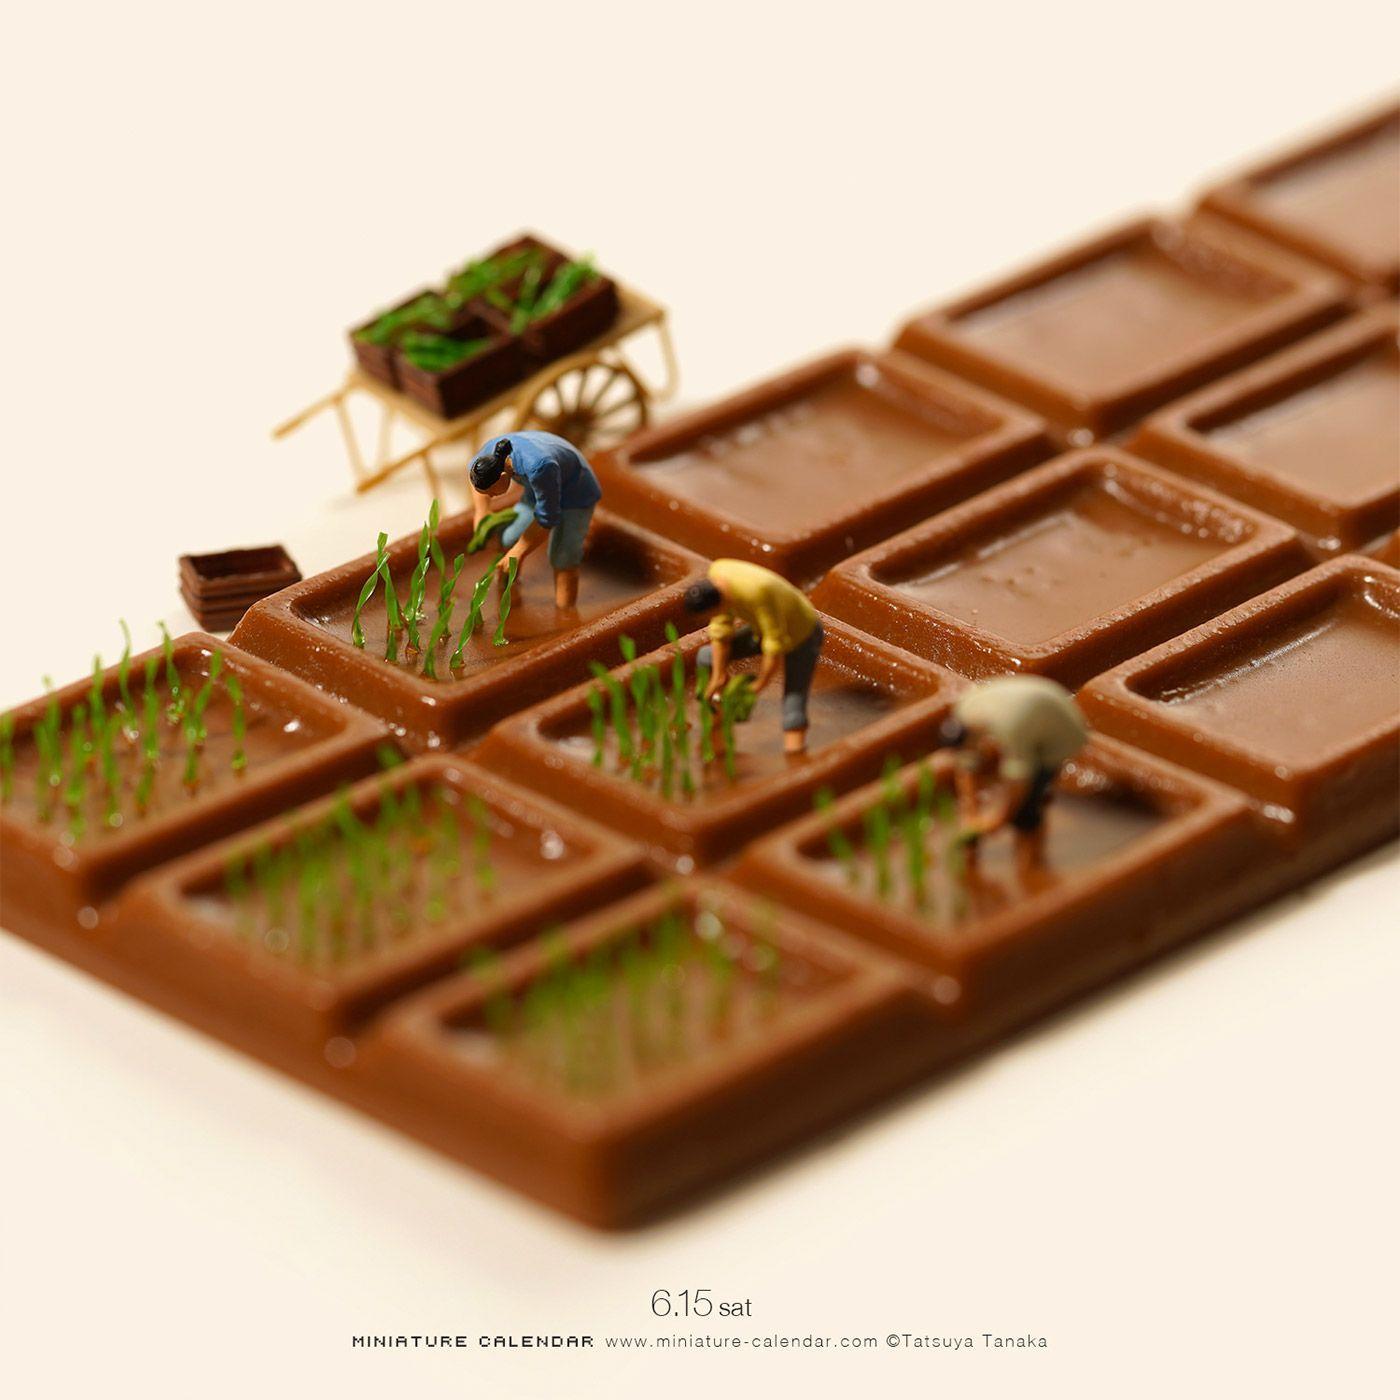 miniature phototgraphy choclate feild tatsuya tanaka